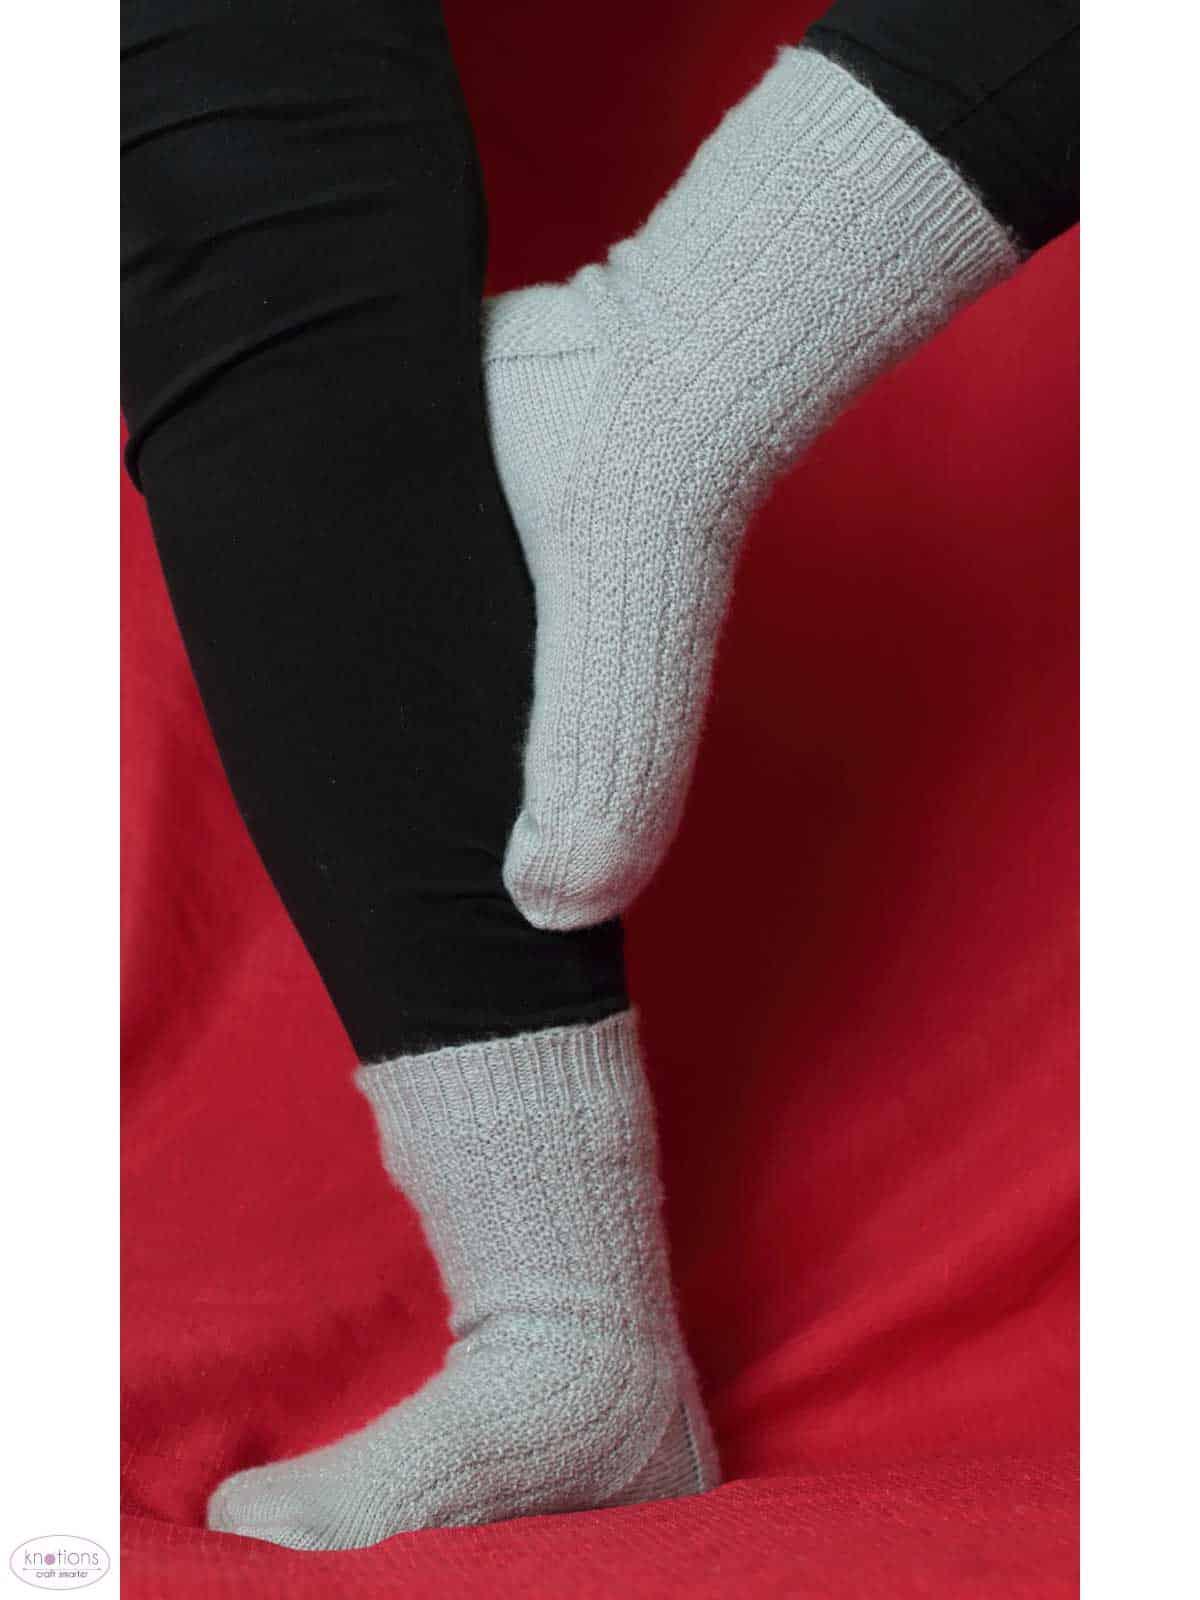 unassuming-socks-1